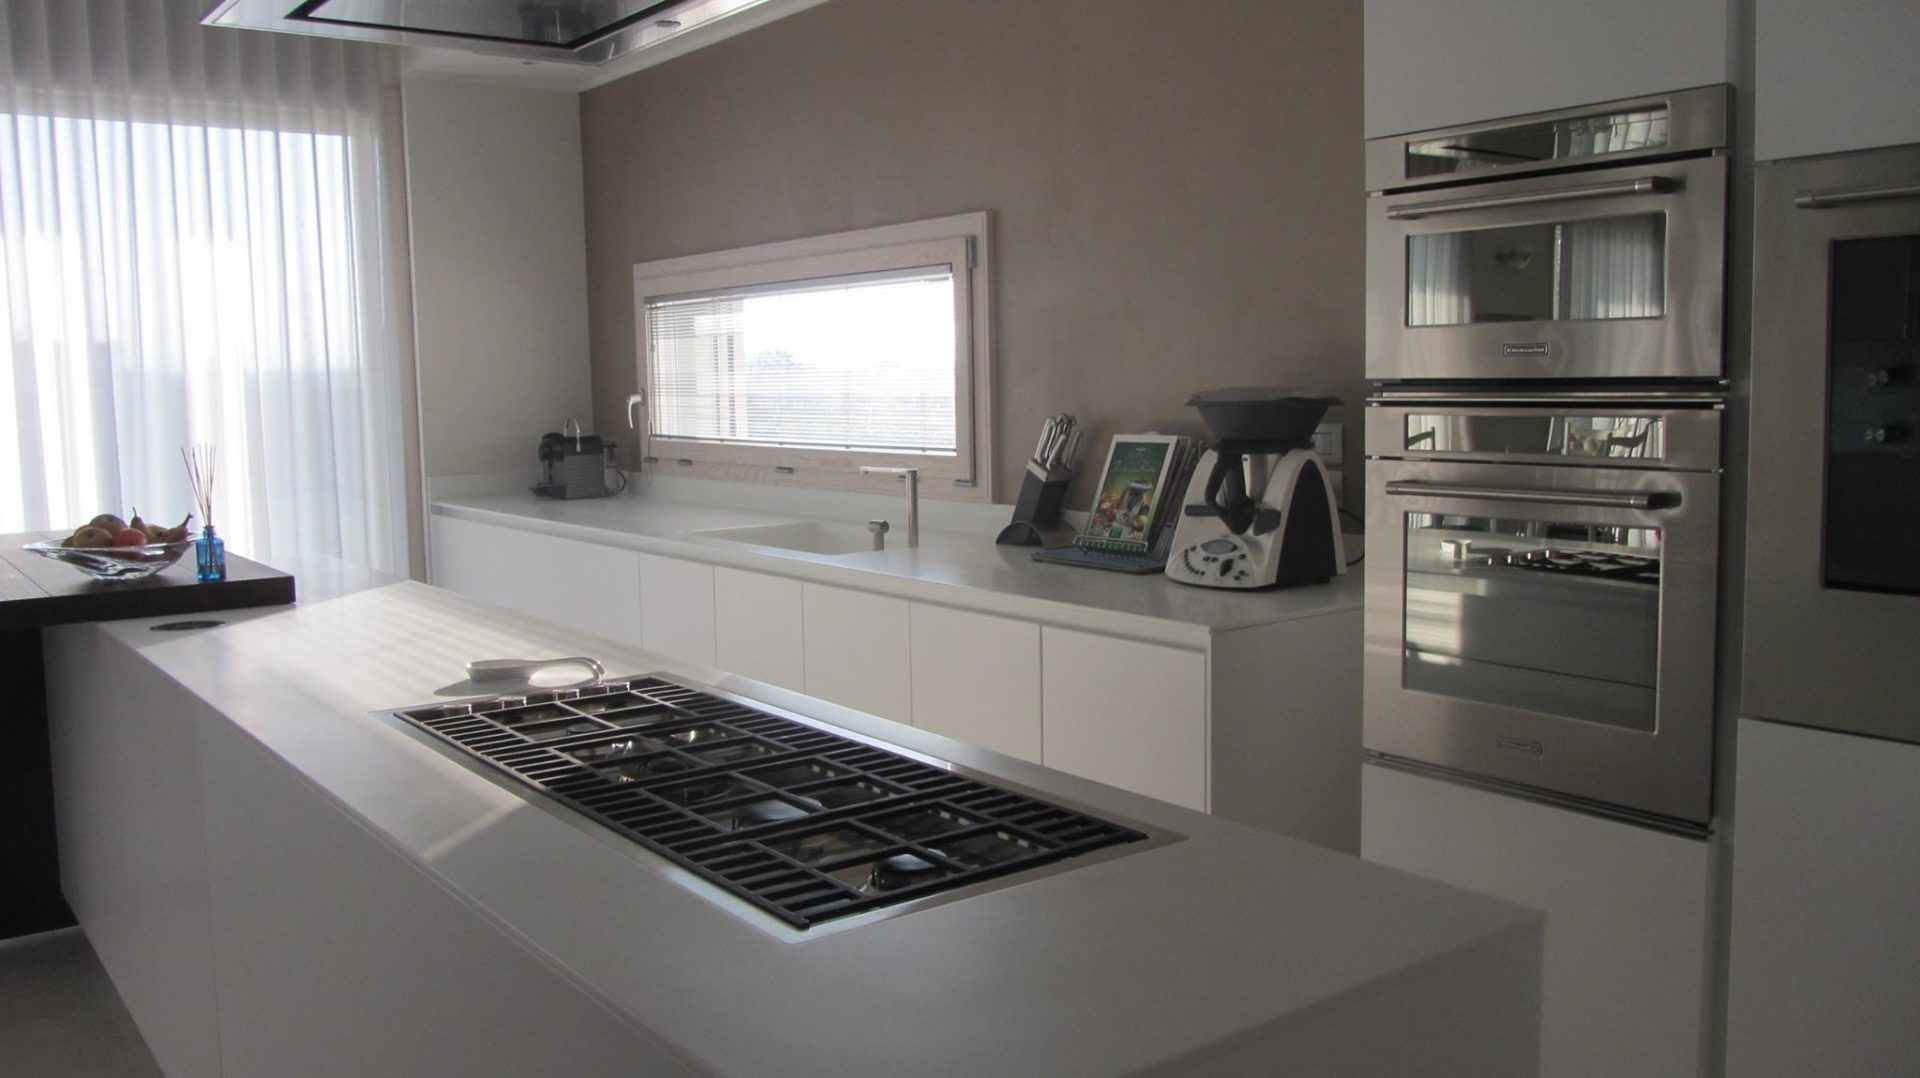 Colonne cucina beautiful cestoni cucina cesti estraibili basi e colonne g with colonne cucina - Cesti estraibili per cucine ...